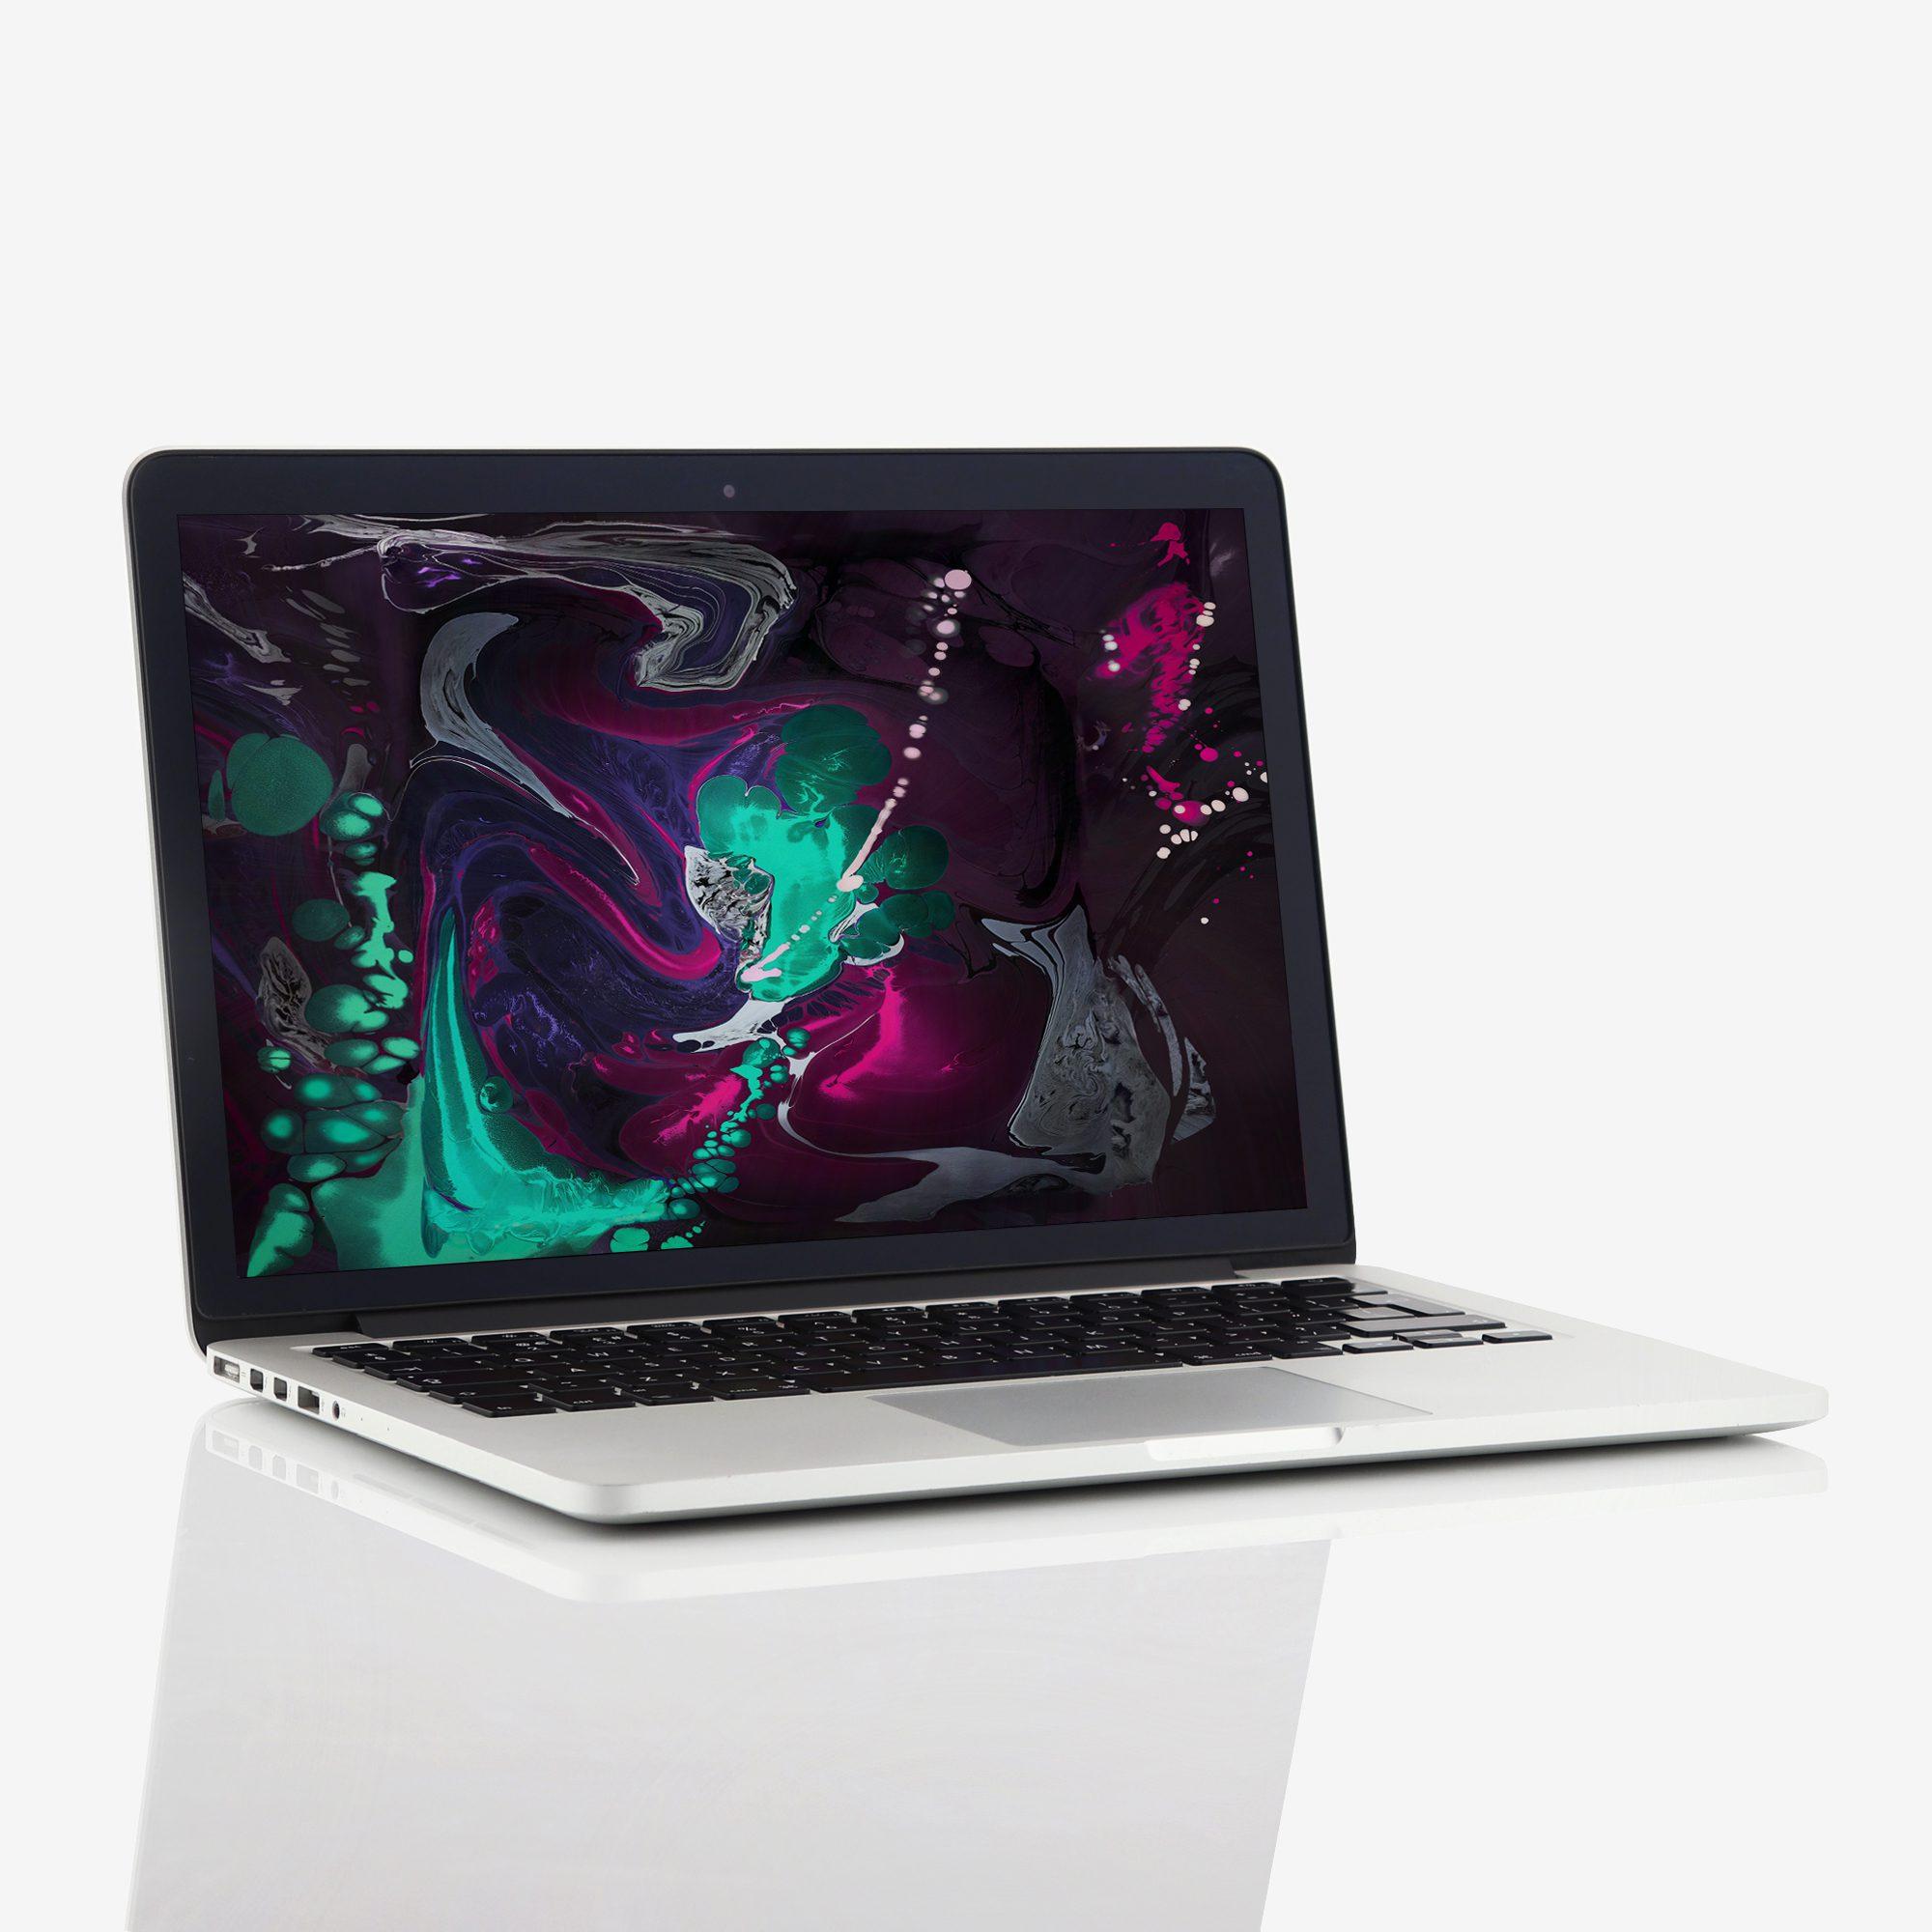 1 x Apple MacBook Pro Retina 13 Inch Dual Core i5 2.70 GHz (2015)